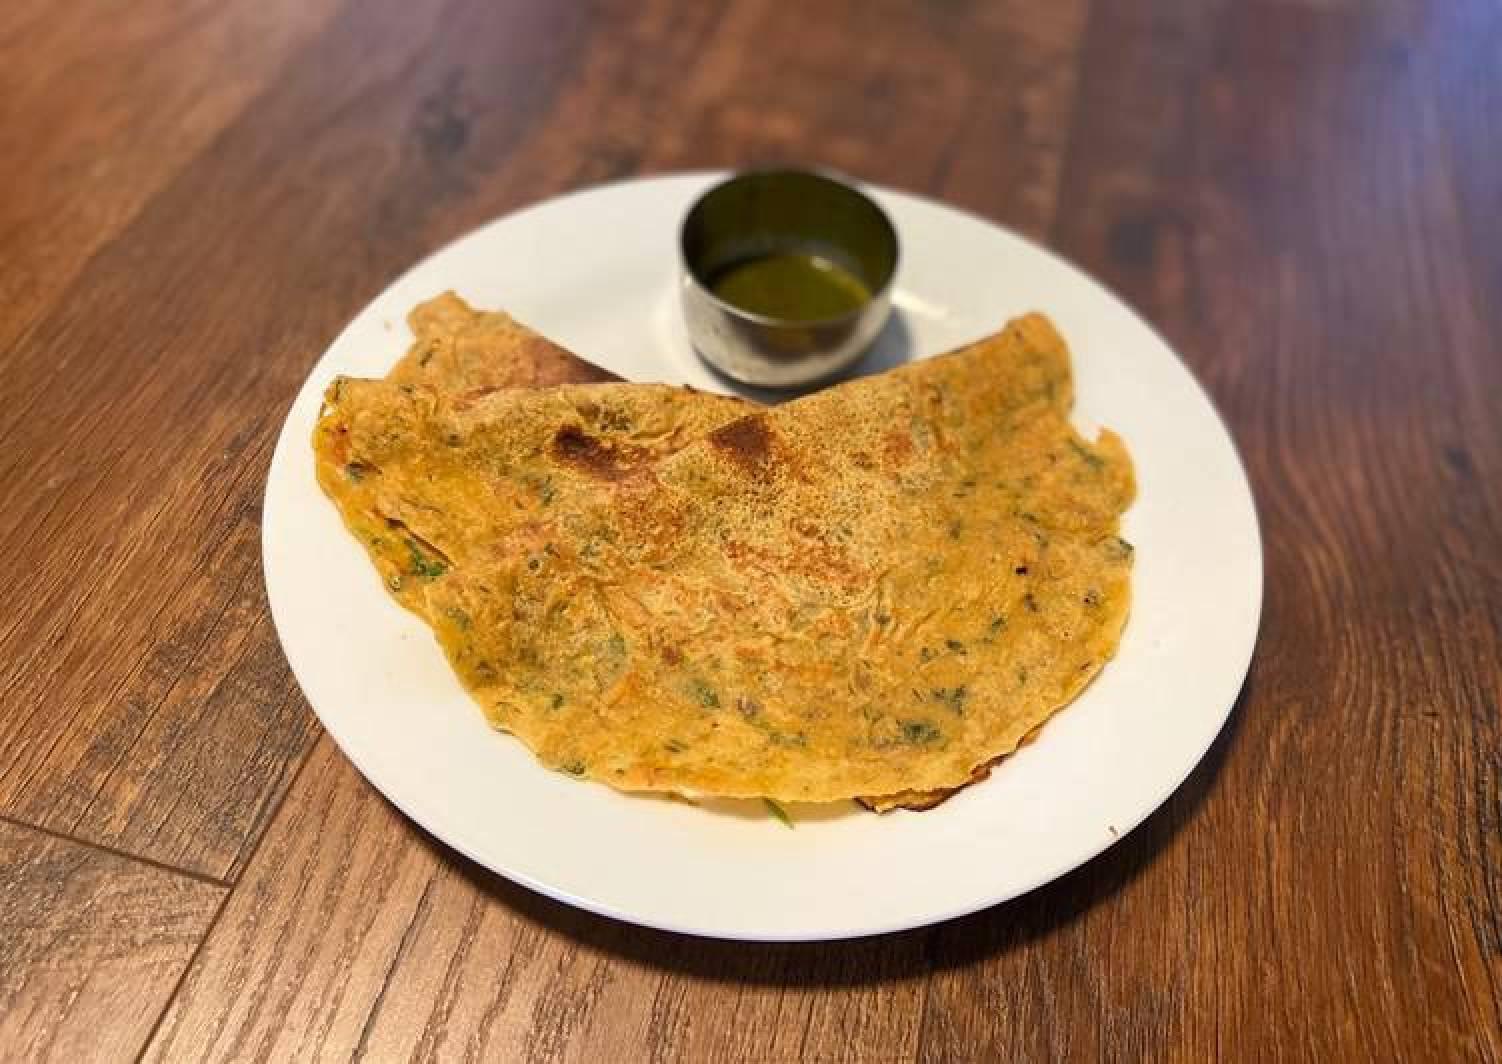 Vegan Chilla/ Chickpea flour pancake